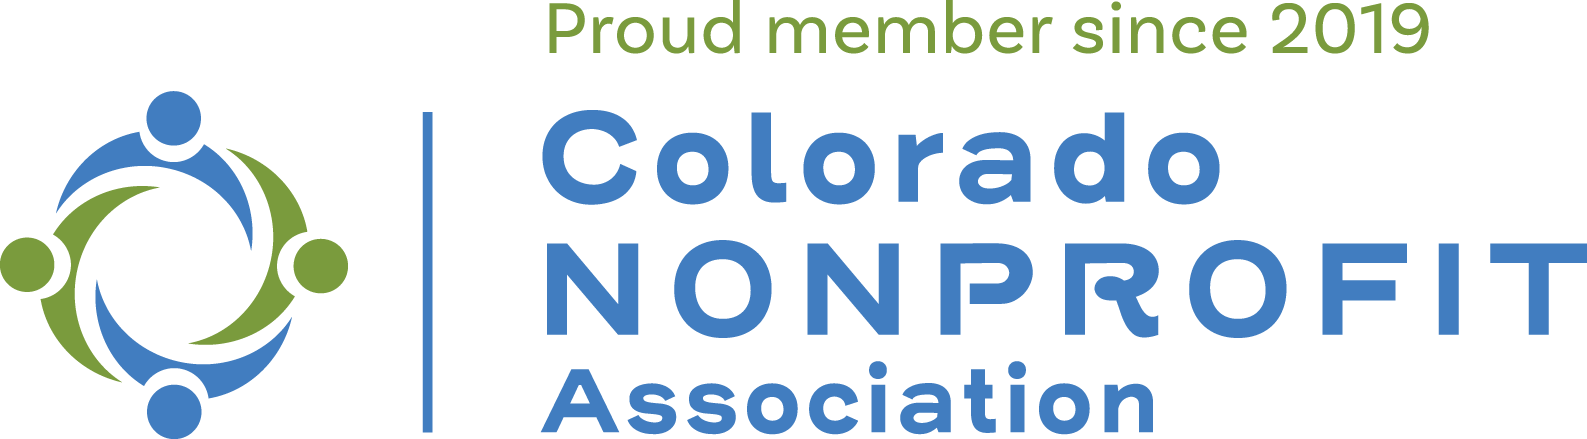 ColoradoNonprofit_MemberLogo_RGB